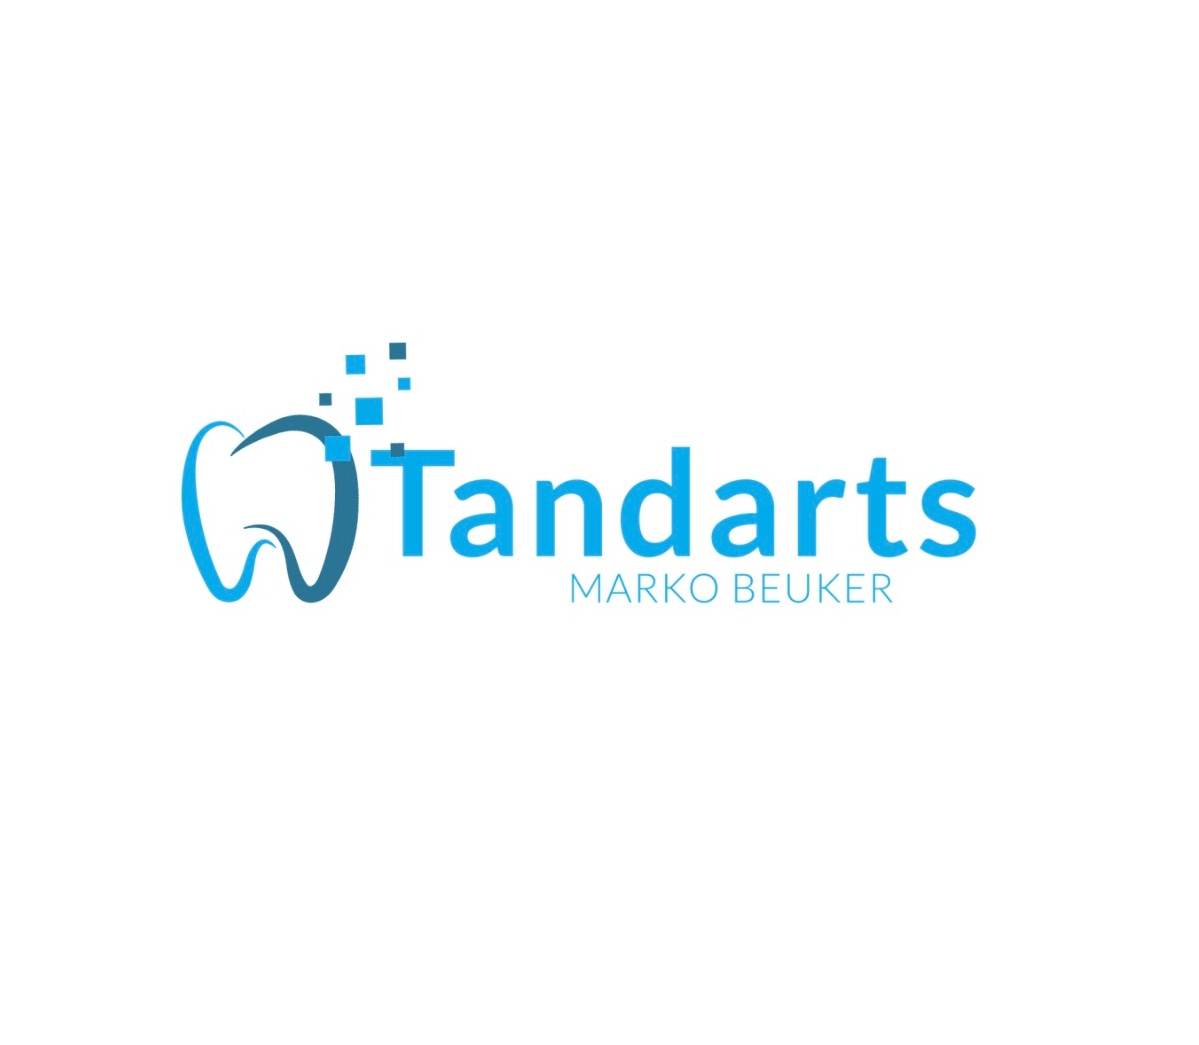 Tandartspraktijk Beuker